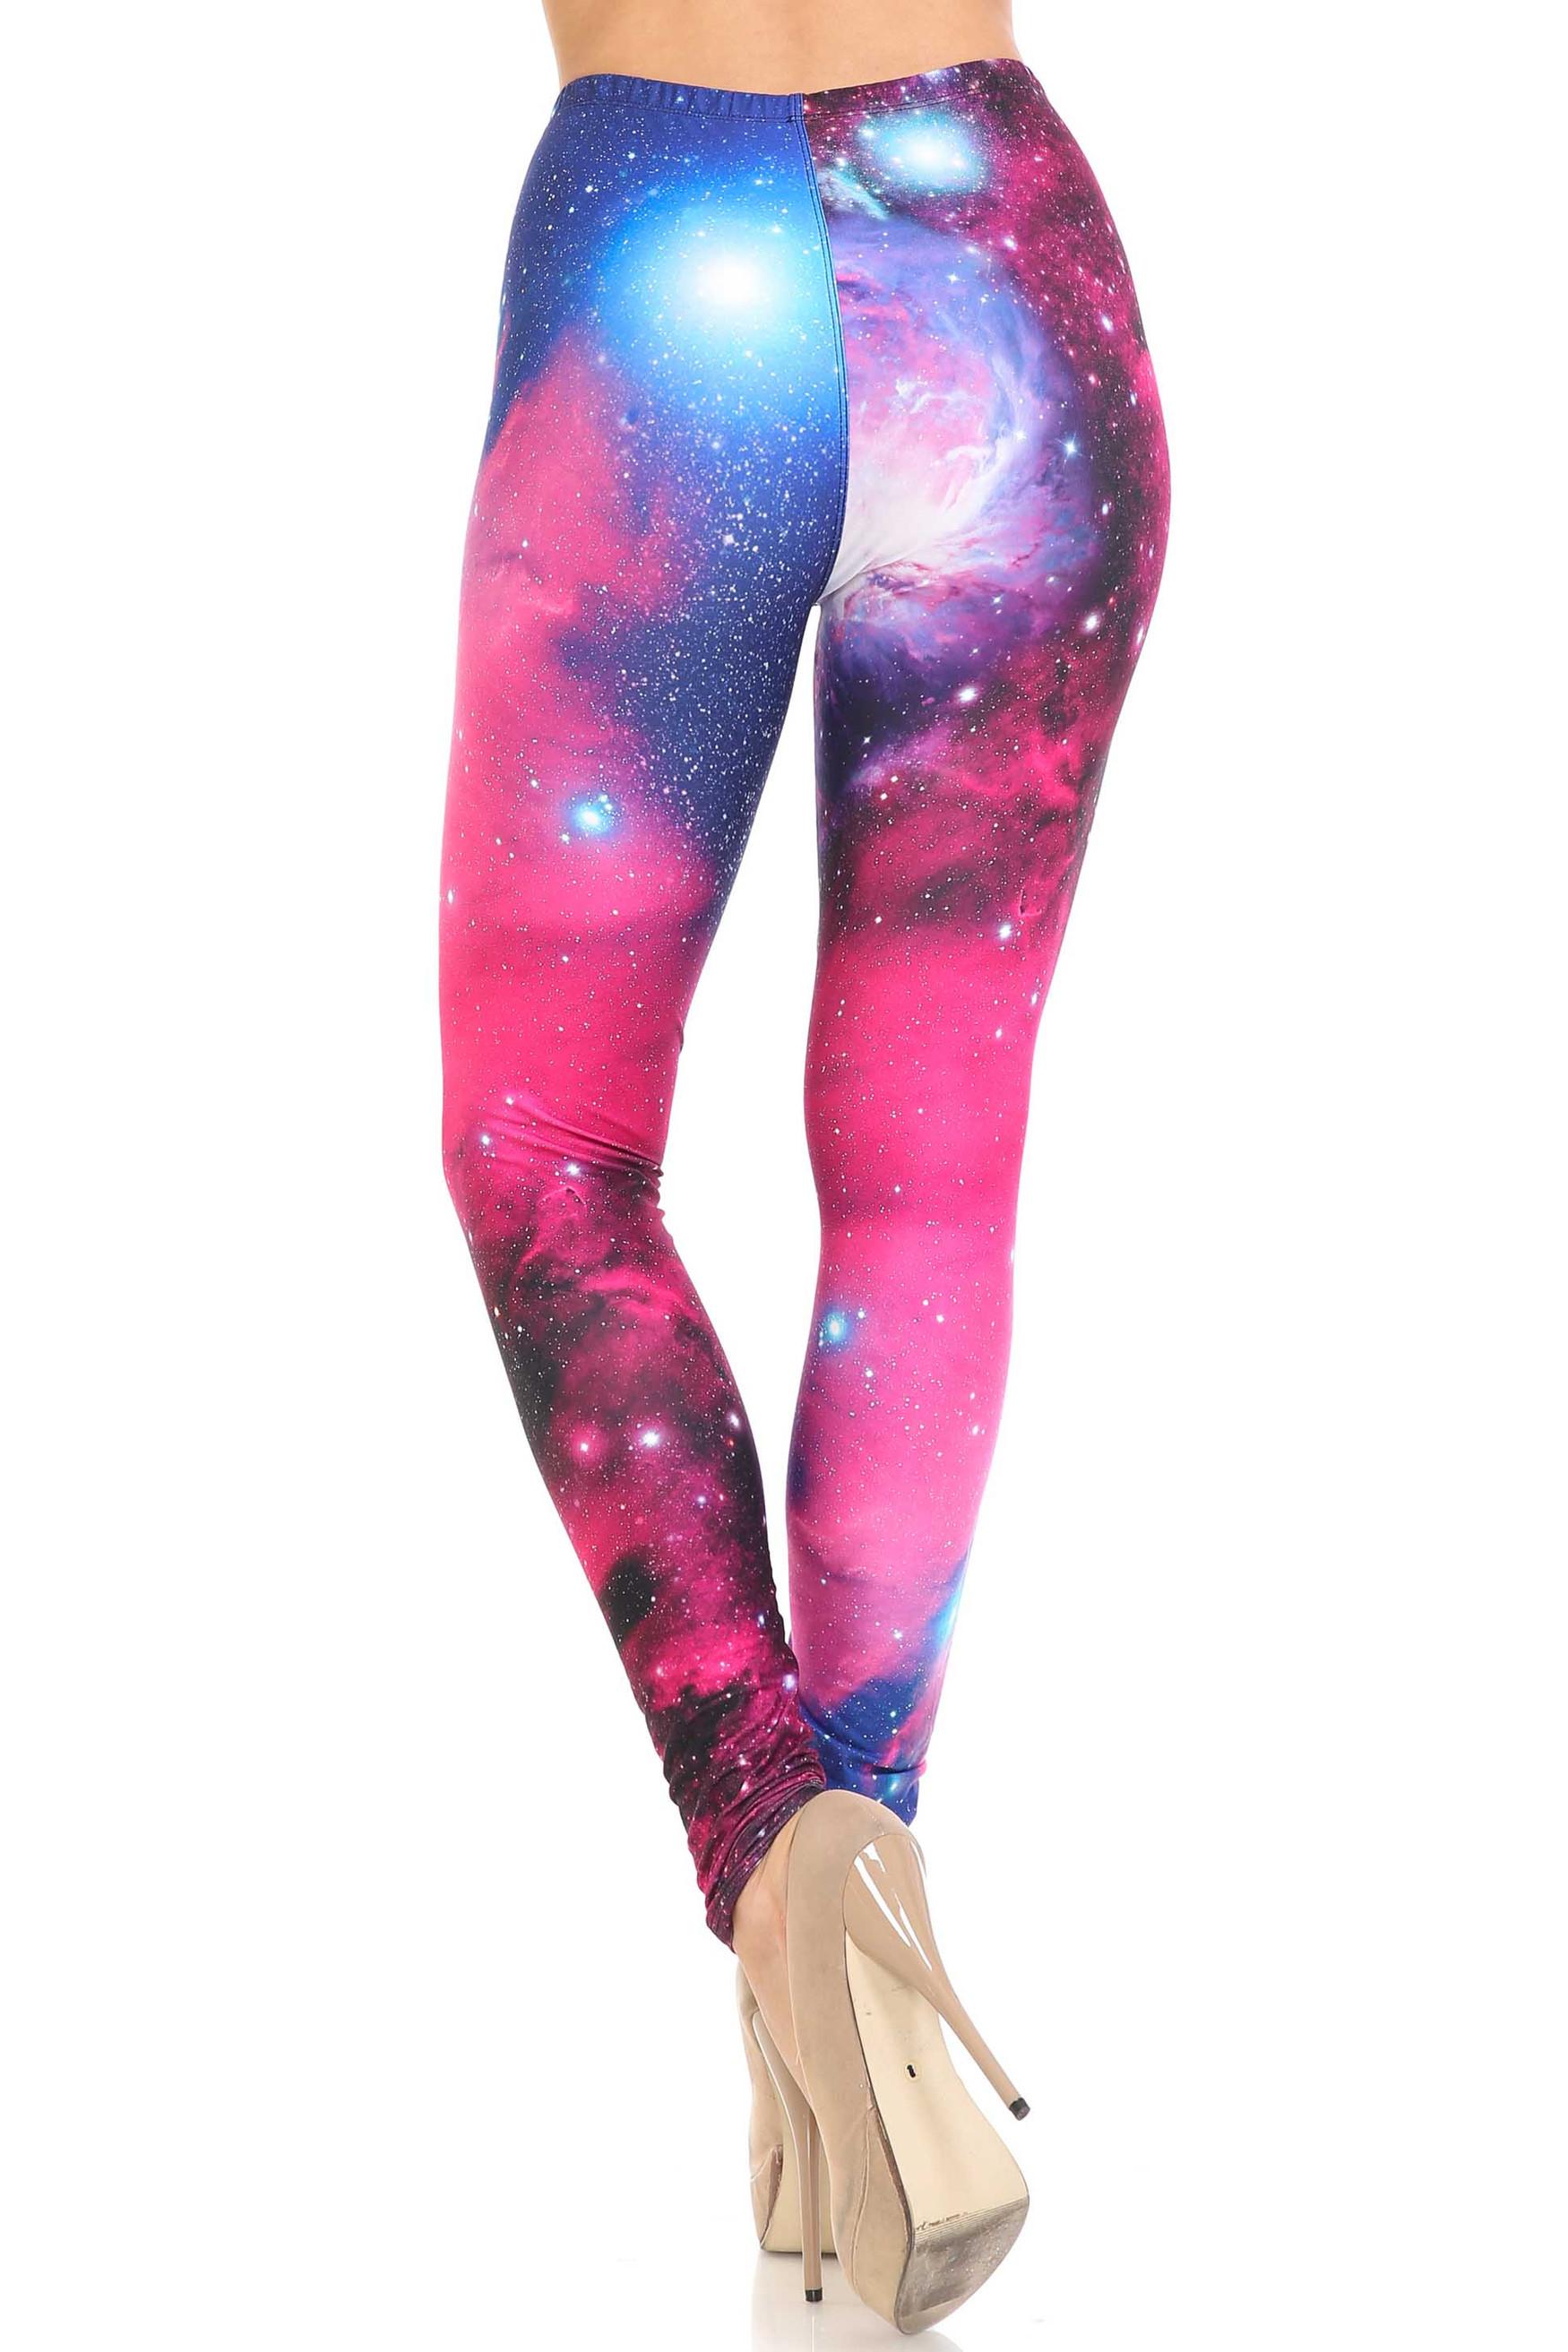 Creamy Soft Fuchsia Galaxy Plus Size Leggings - USA Fashion™